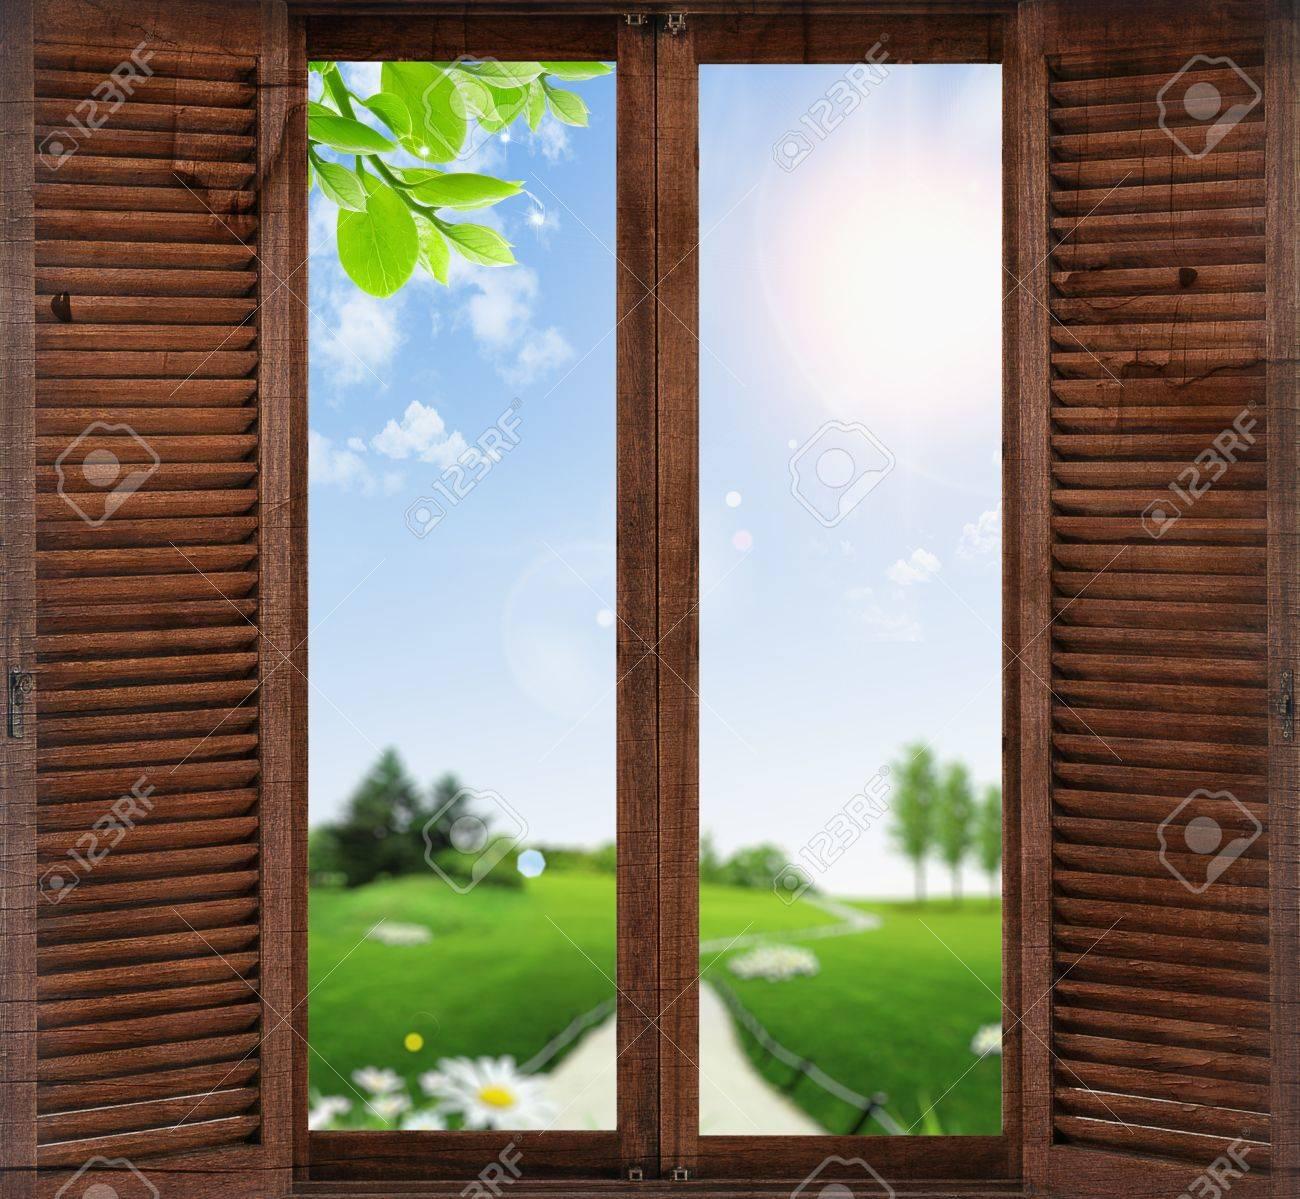 window overlooking the garden Stock Photo - 16292371